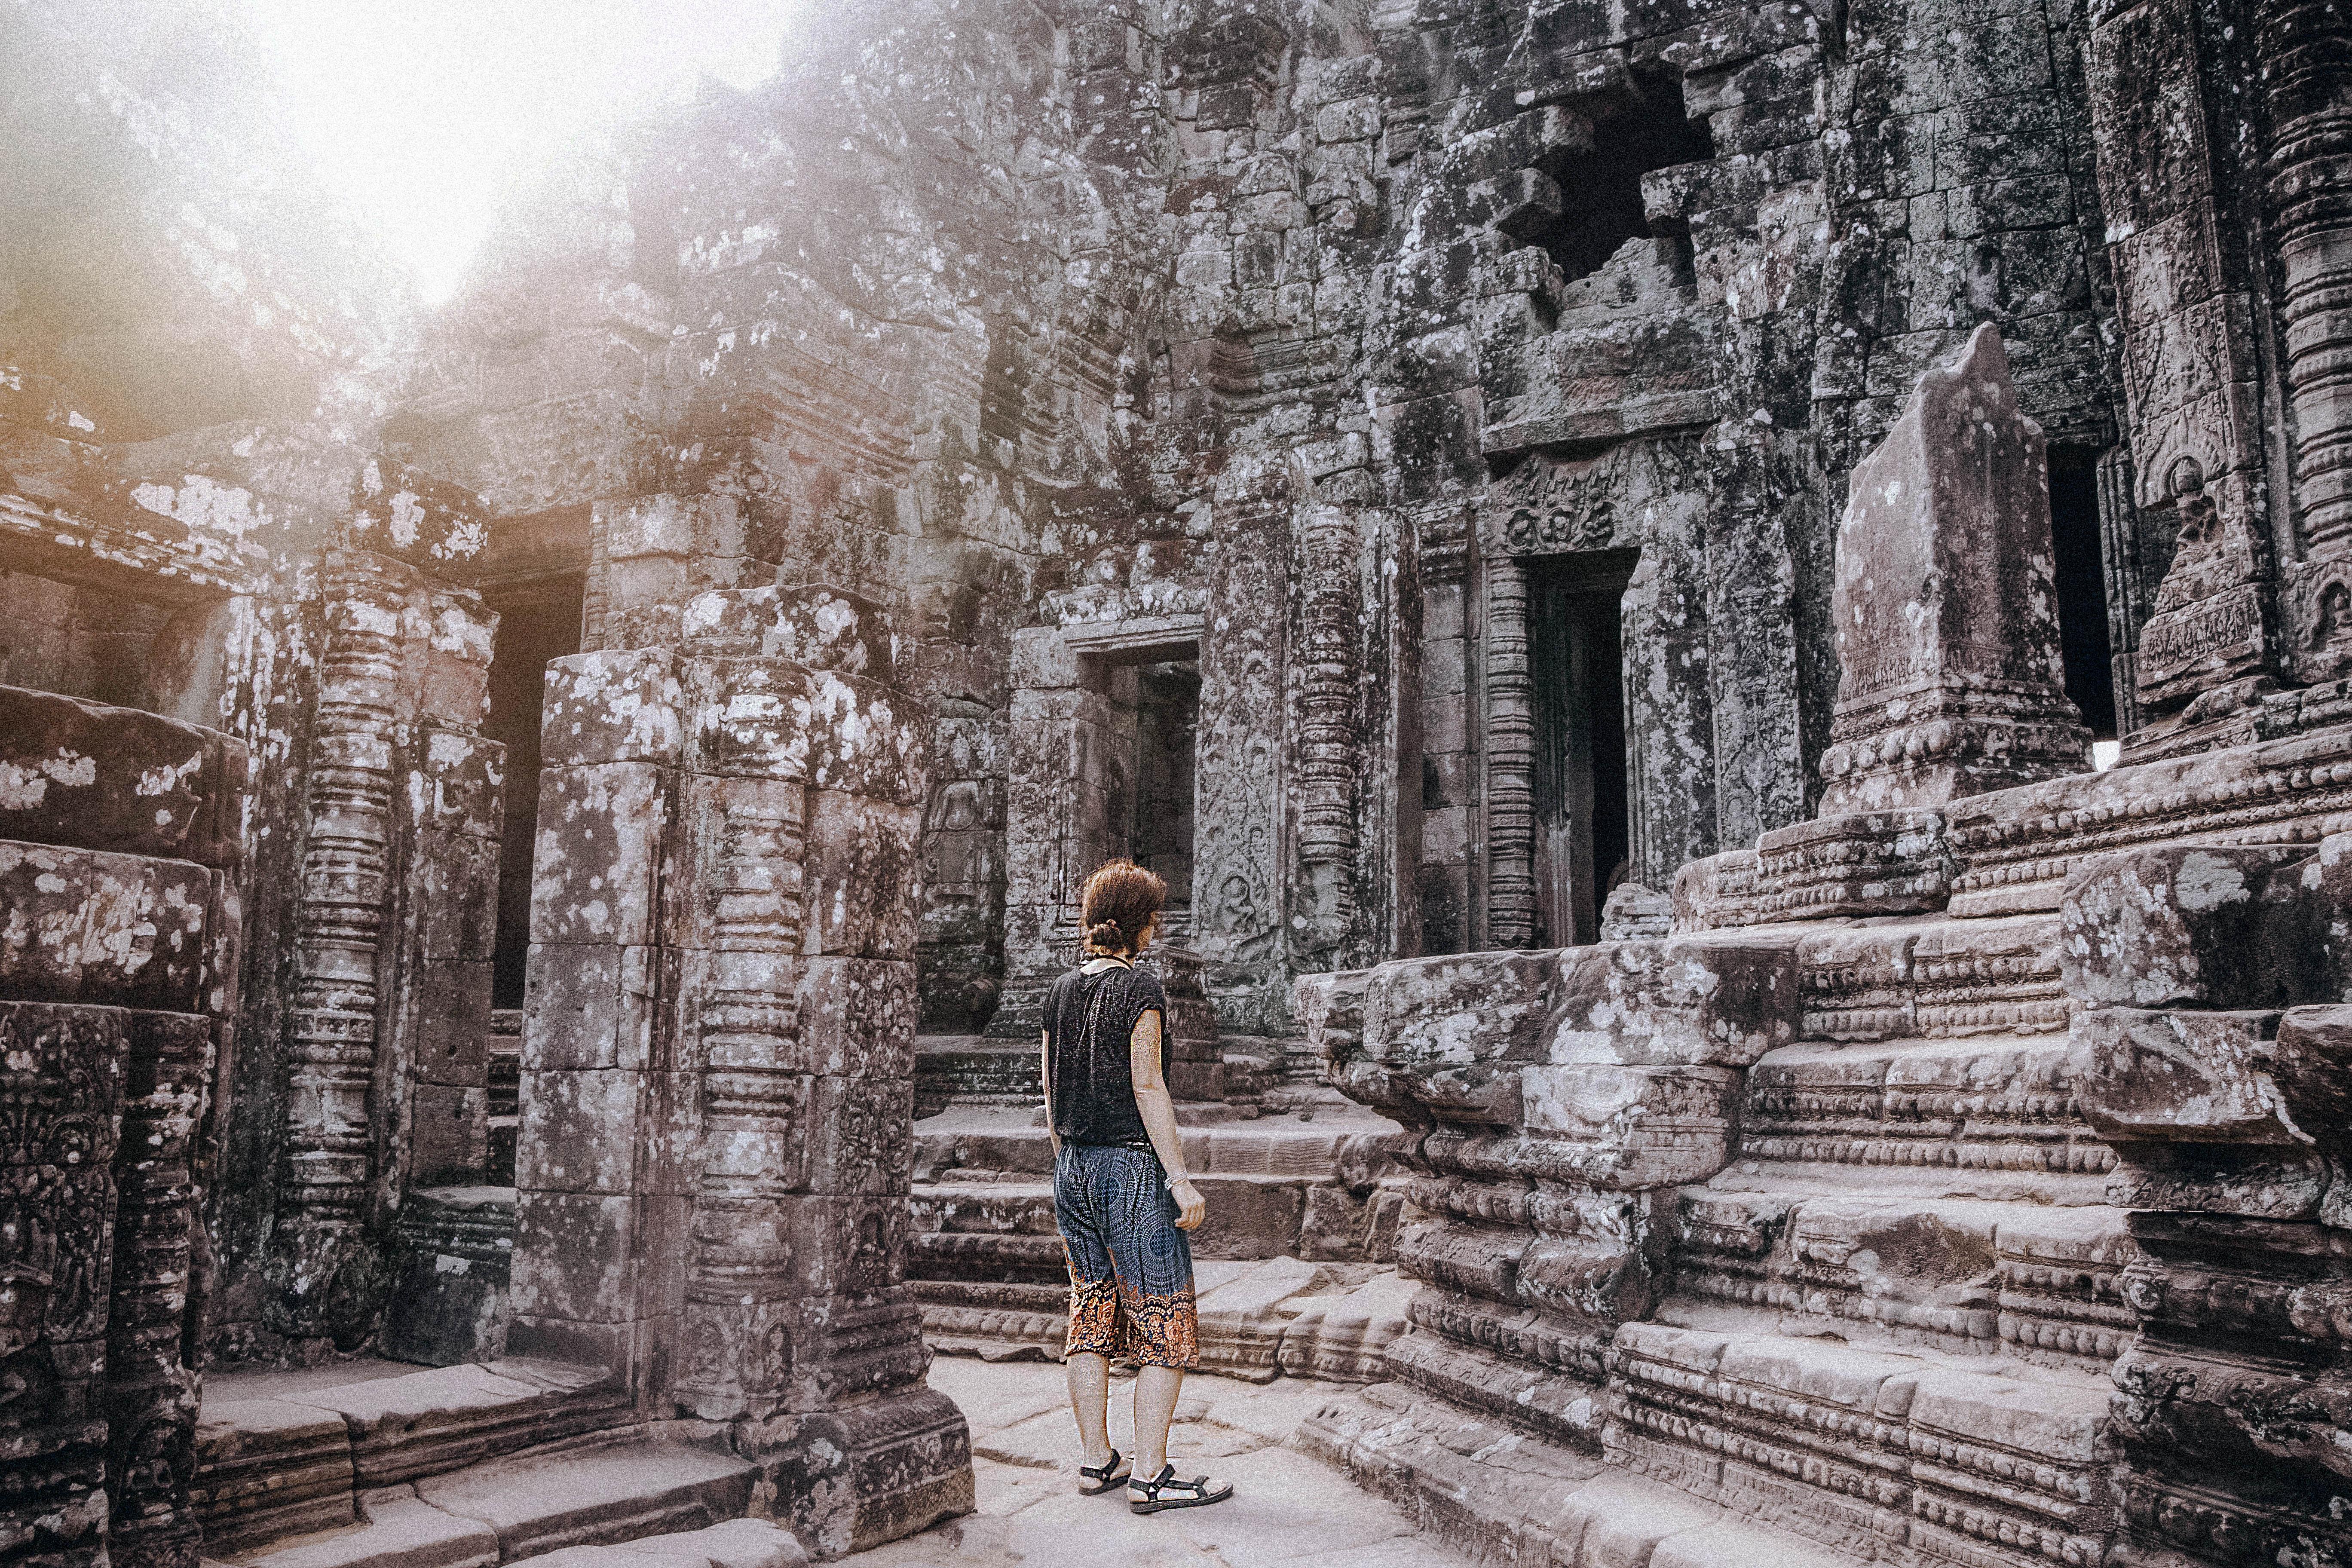 cambodia siem reap exploring ancient temples sunrise